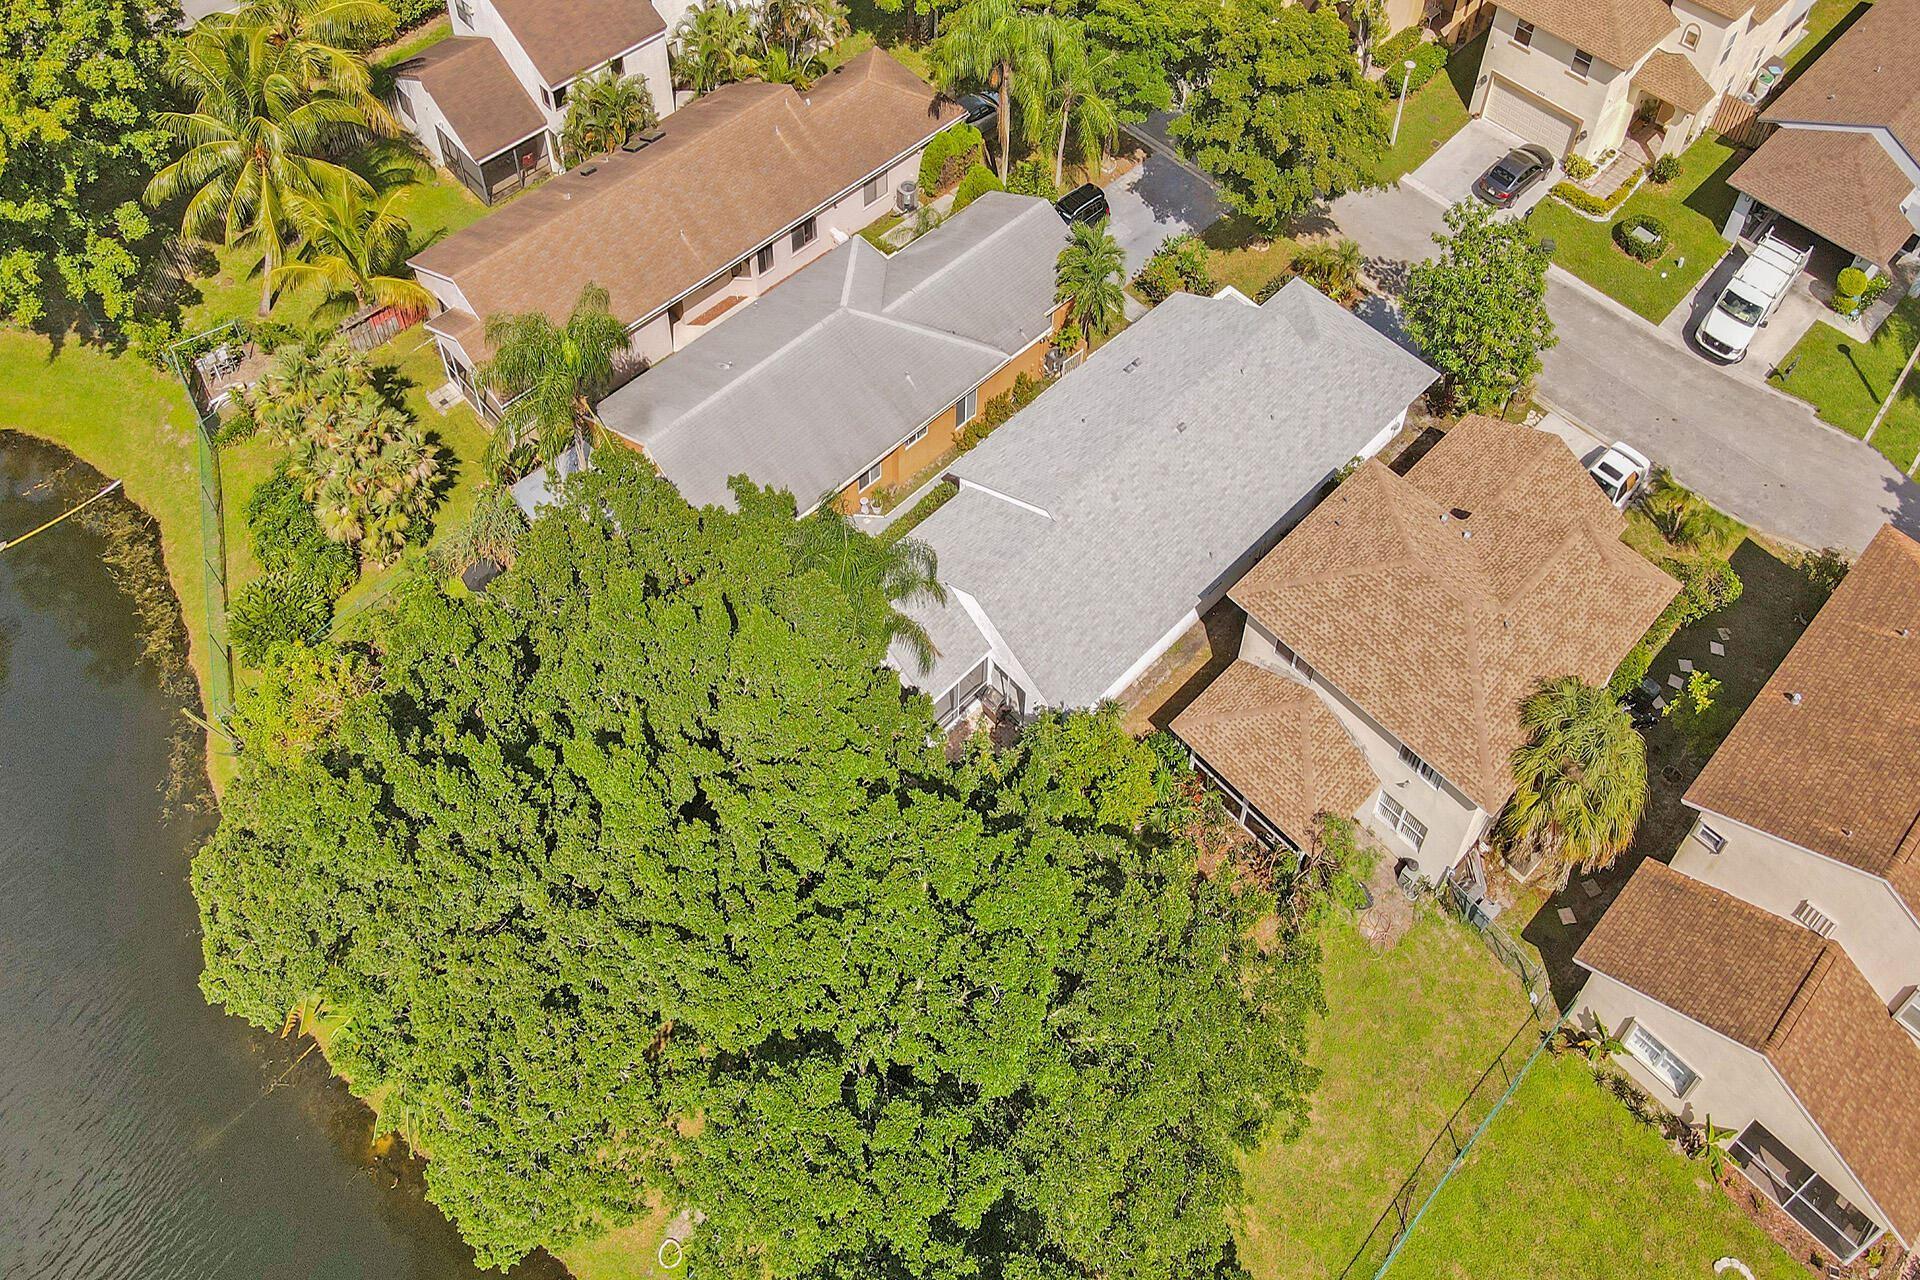 Photo of 2373 NW 34th Terrace, Coconut Creek, FL 33066 (MLS # RX-10752155)